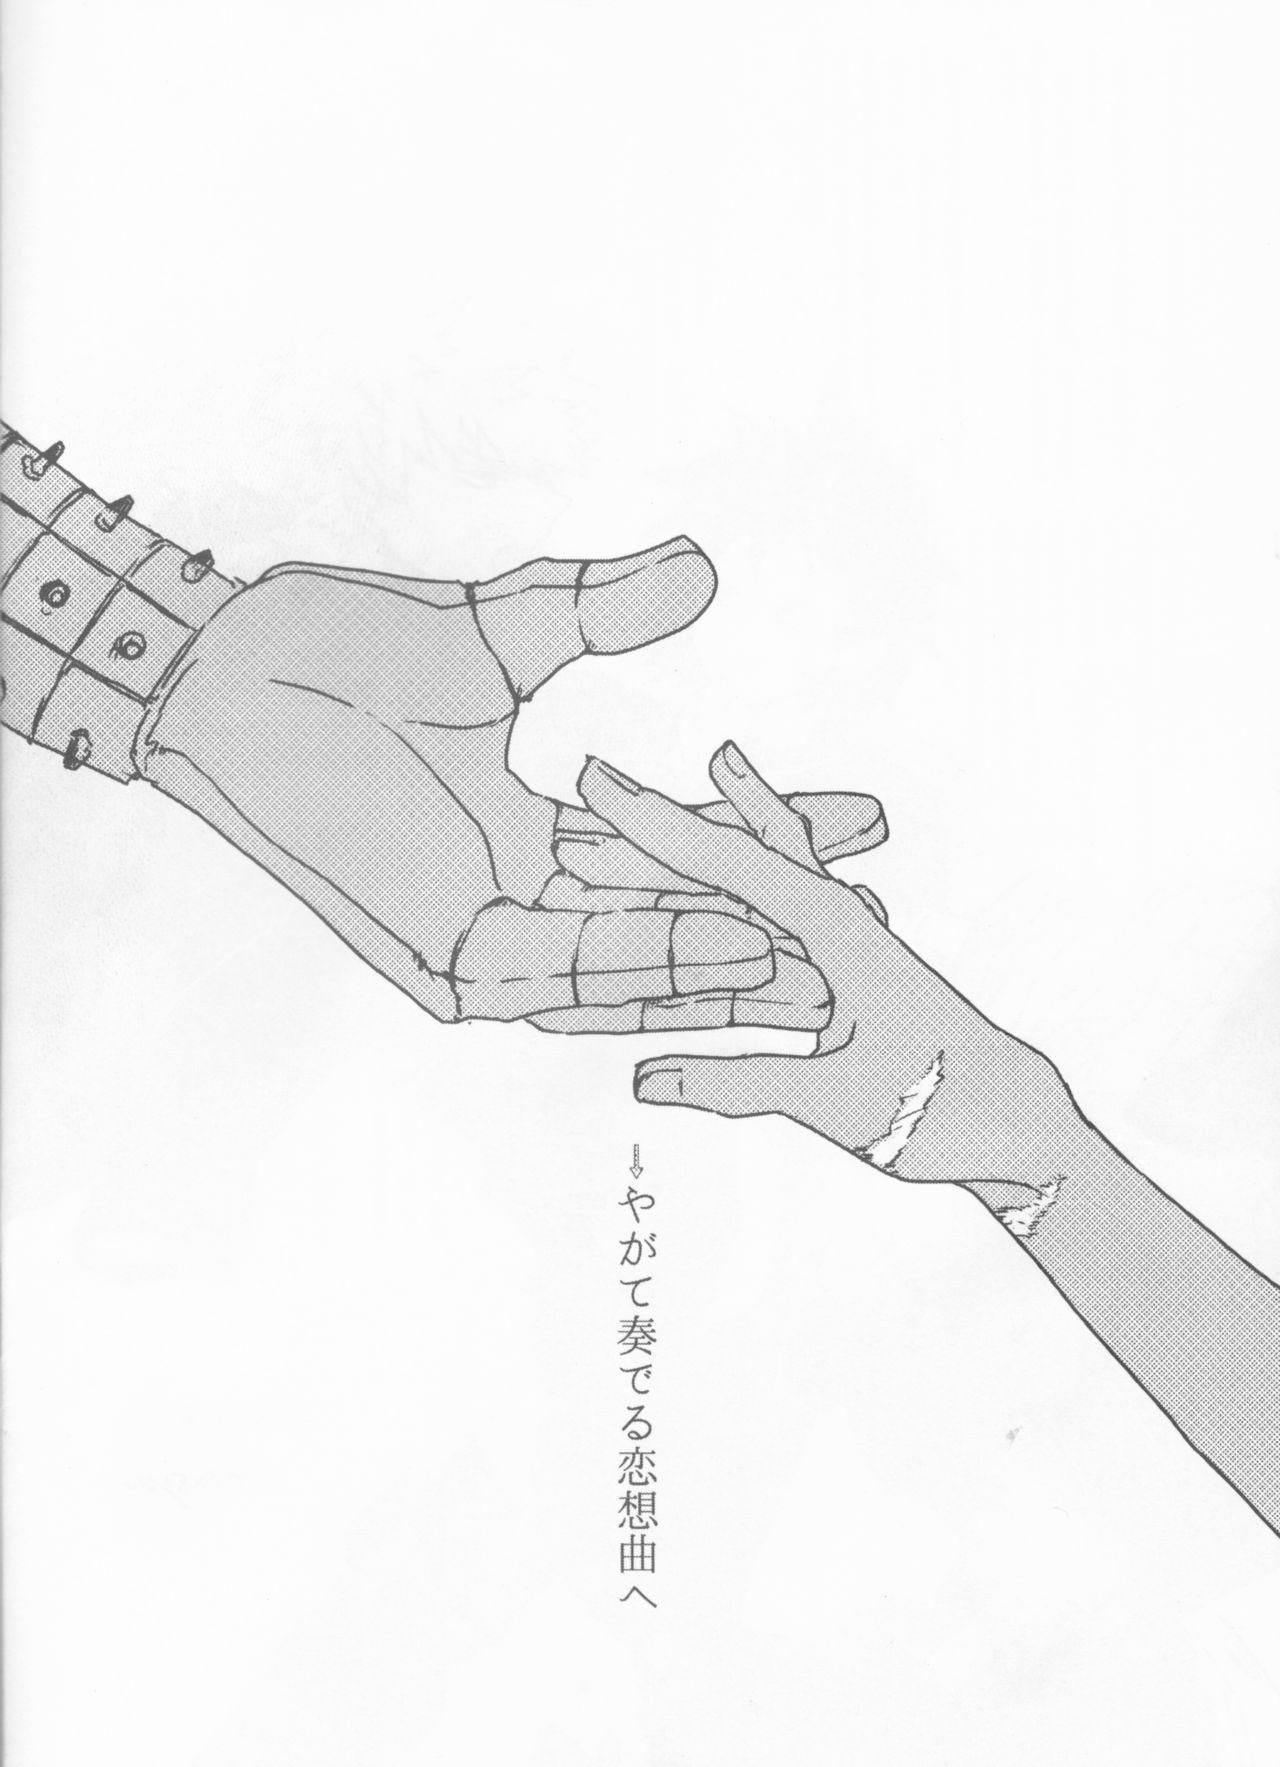 Kayowanu Futari no Kansoukyoku 11